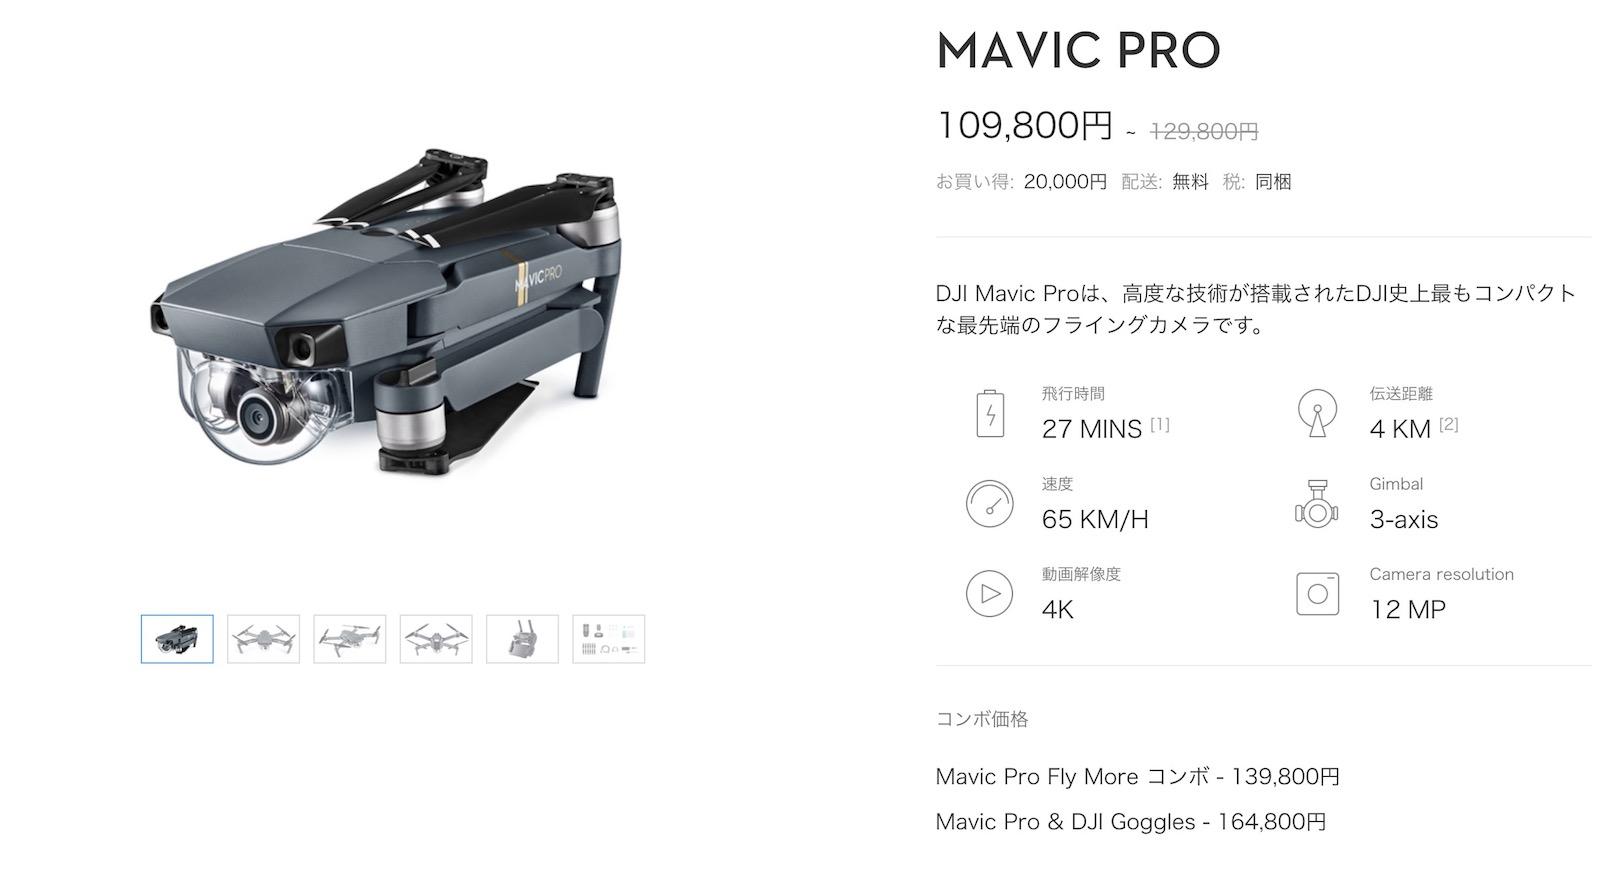 Mavic Pro 20000yen off